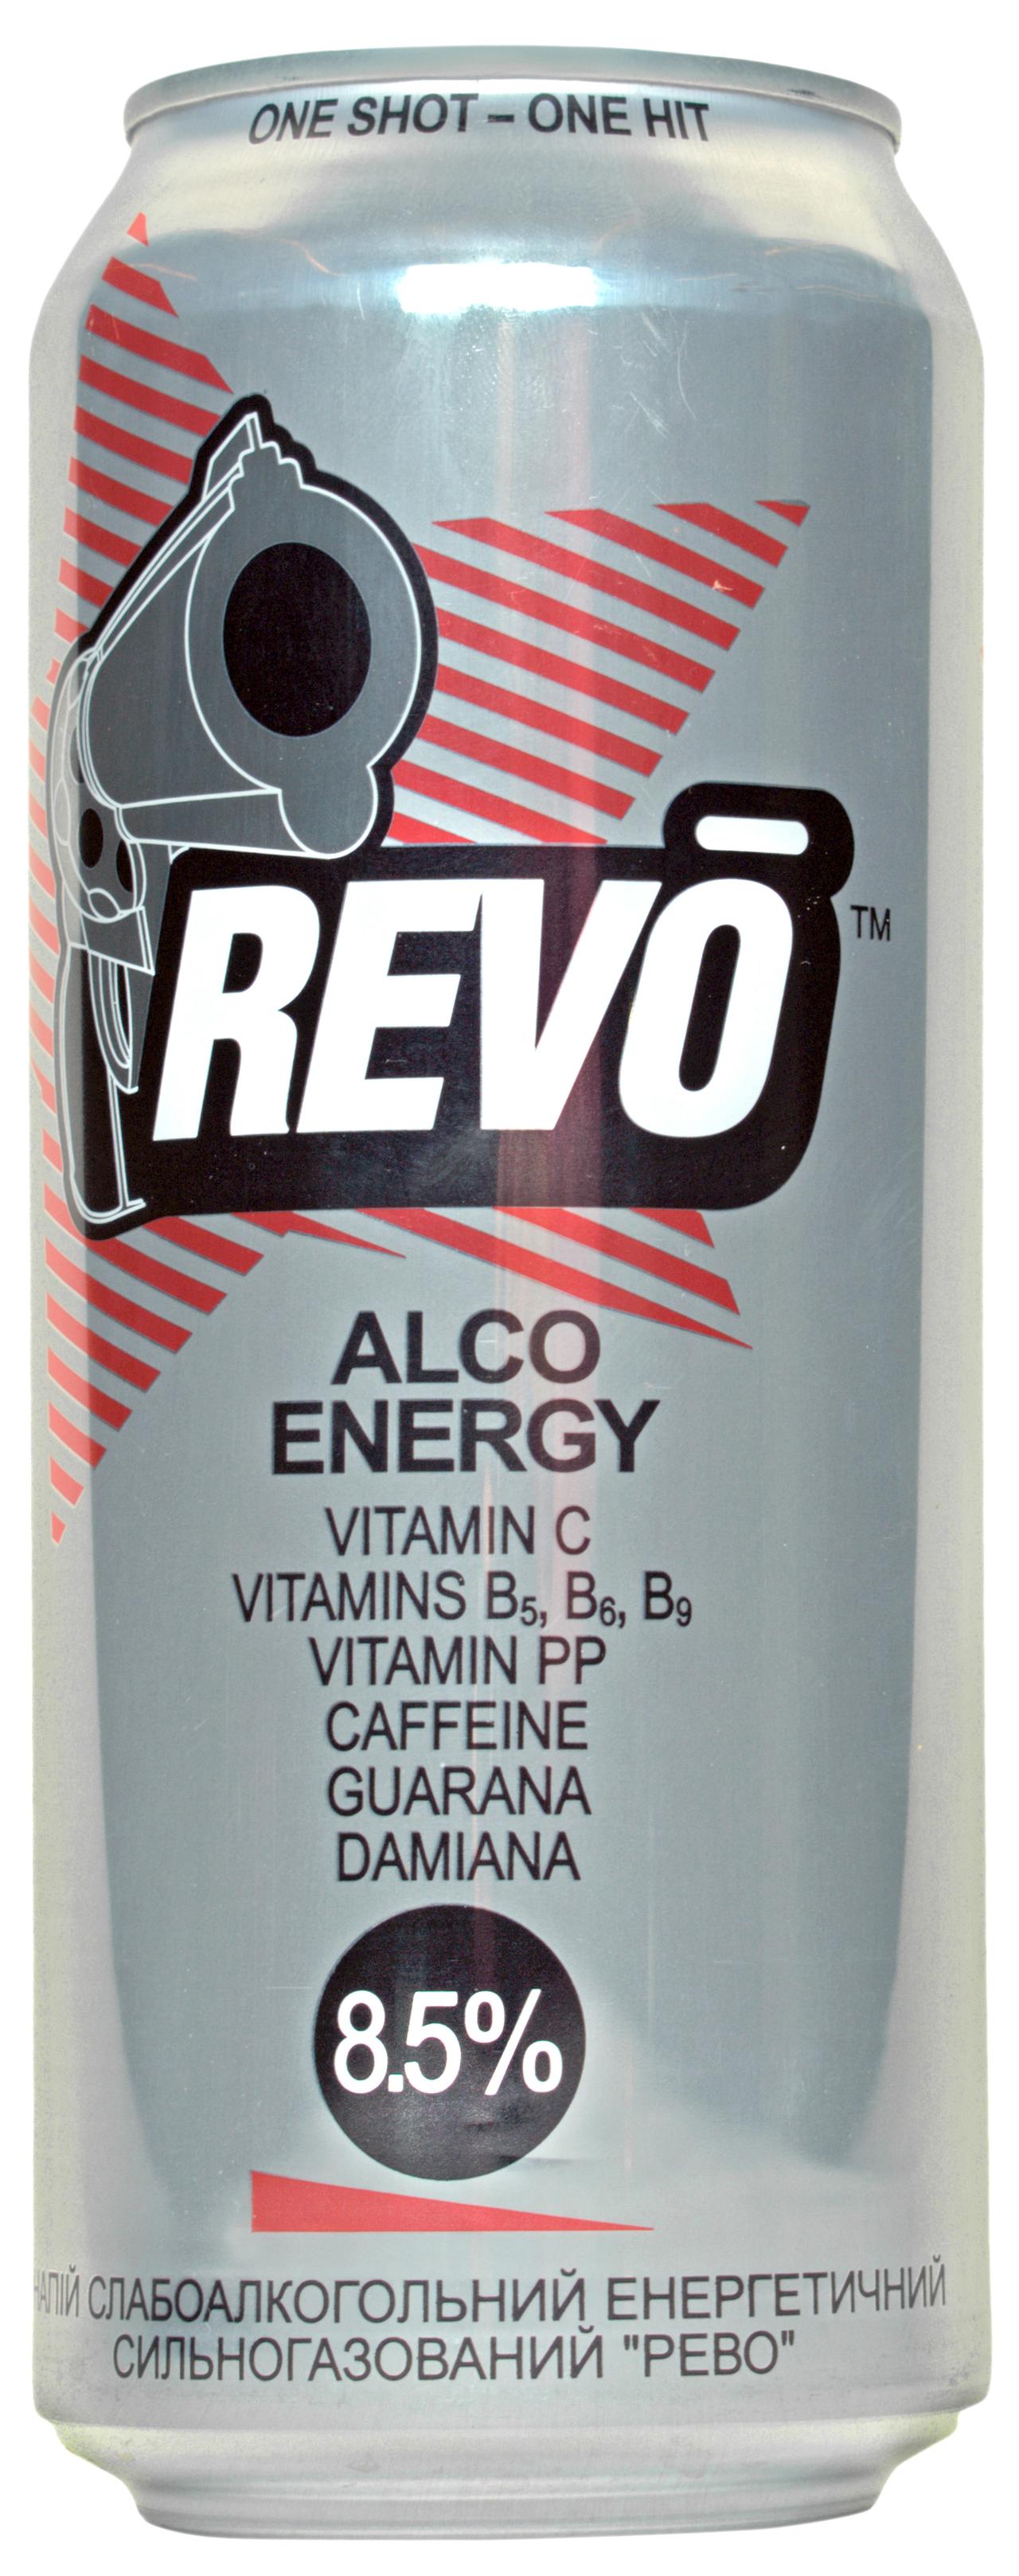 Напій Revo сл/алк сил/газ енергетичний 8-8,5% 0,5л ж/б